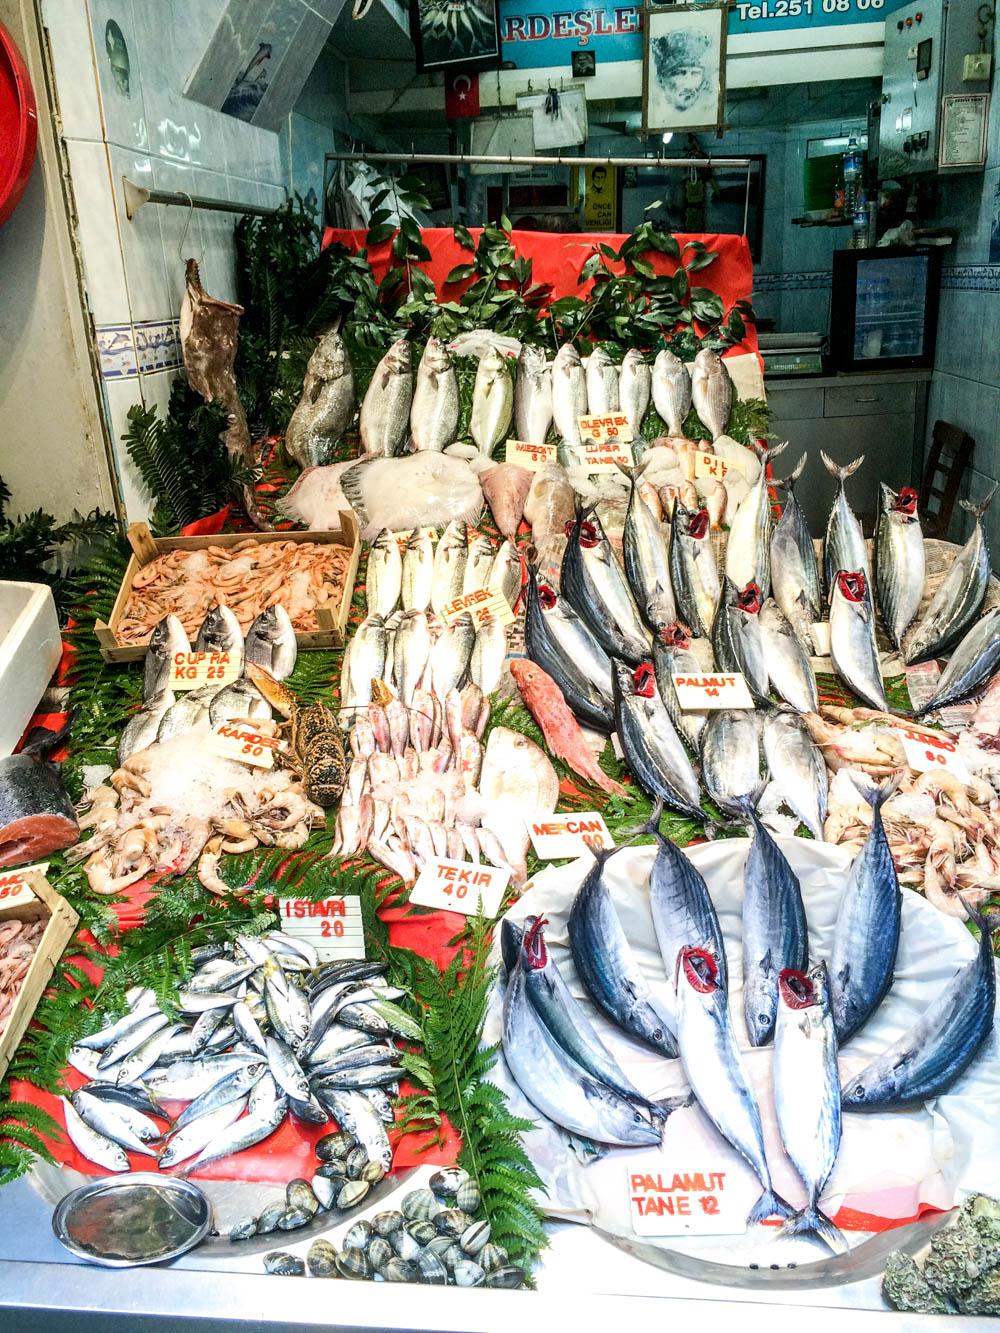 Mackerel - Beyoglu fish market near Istiklal Caddesi, Istanbul / A kitchen in Istanbul